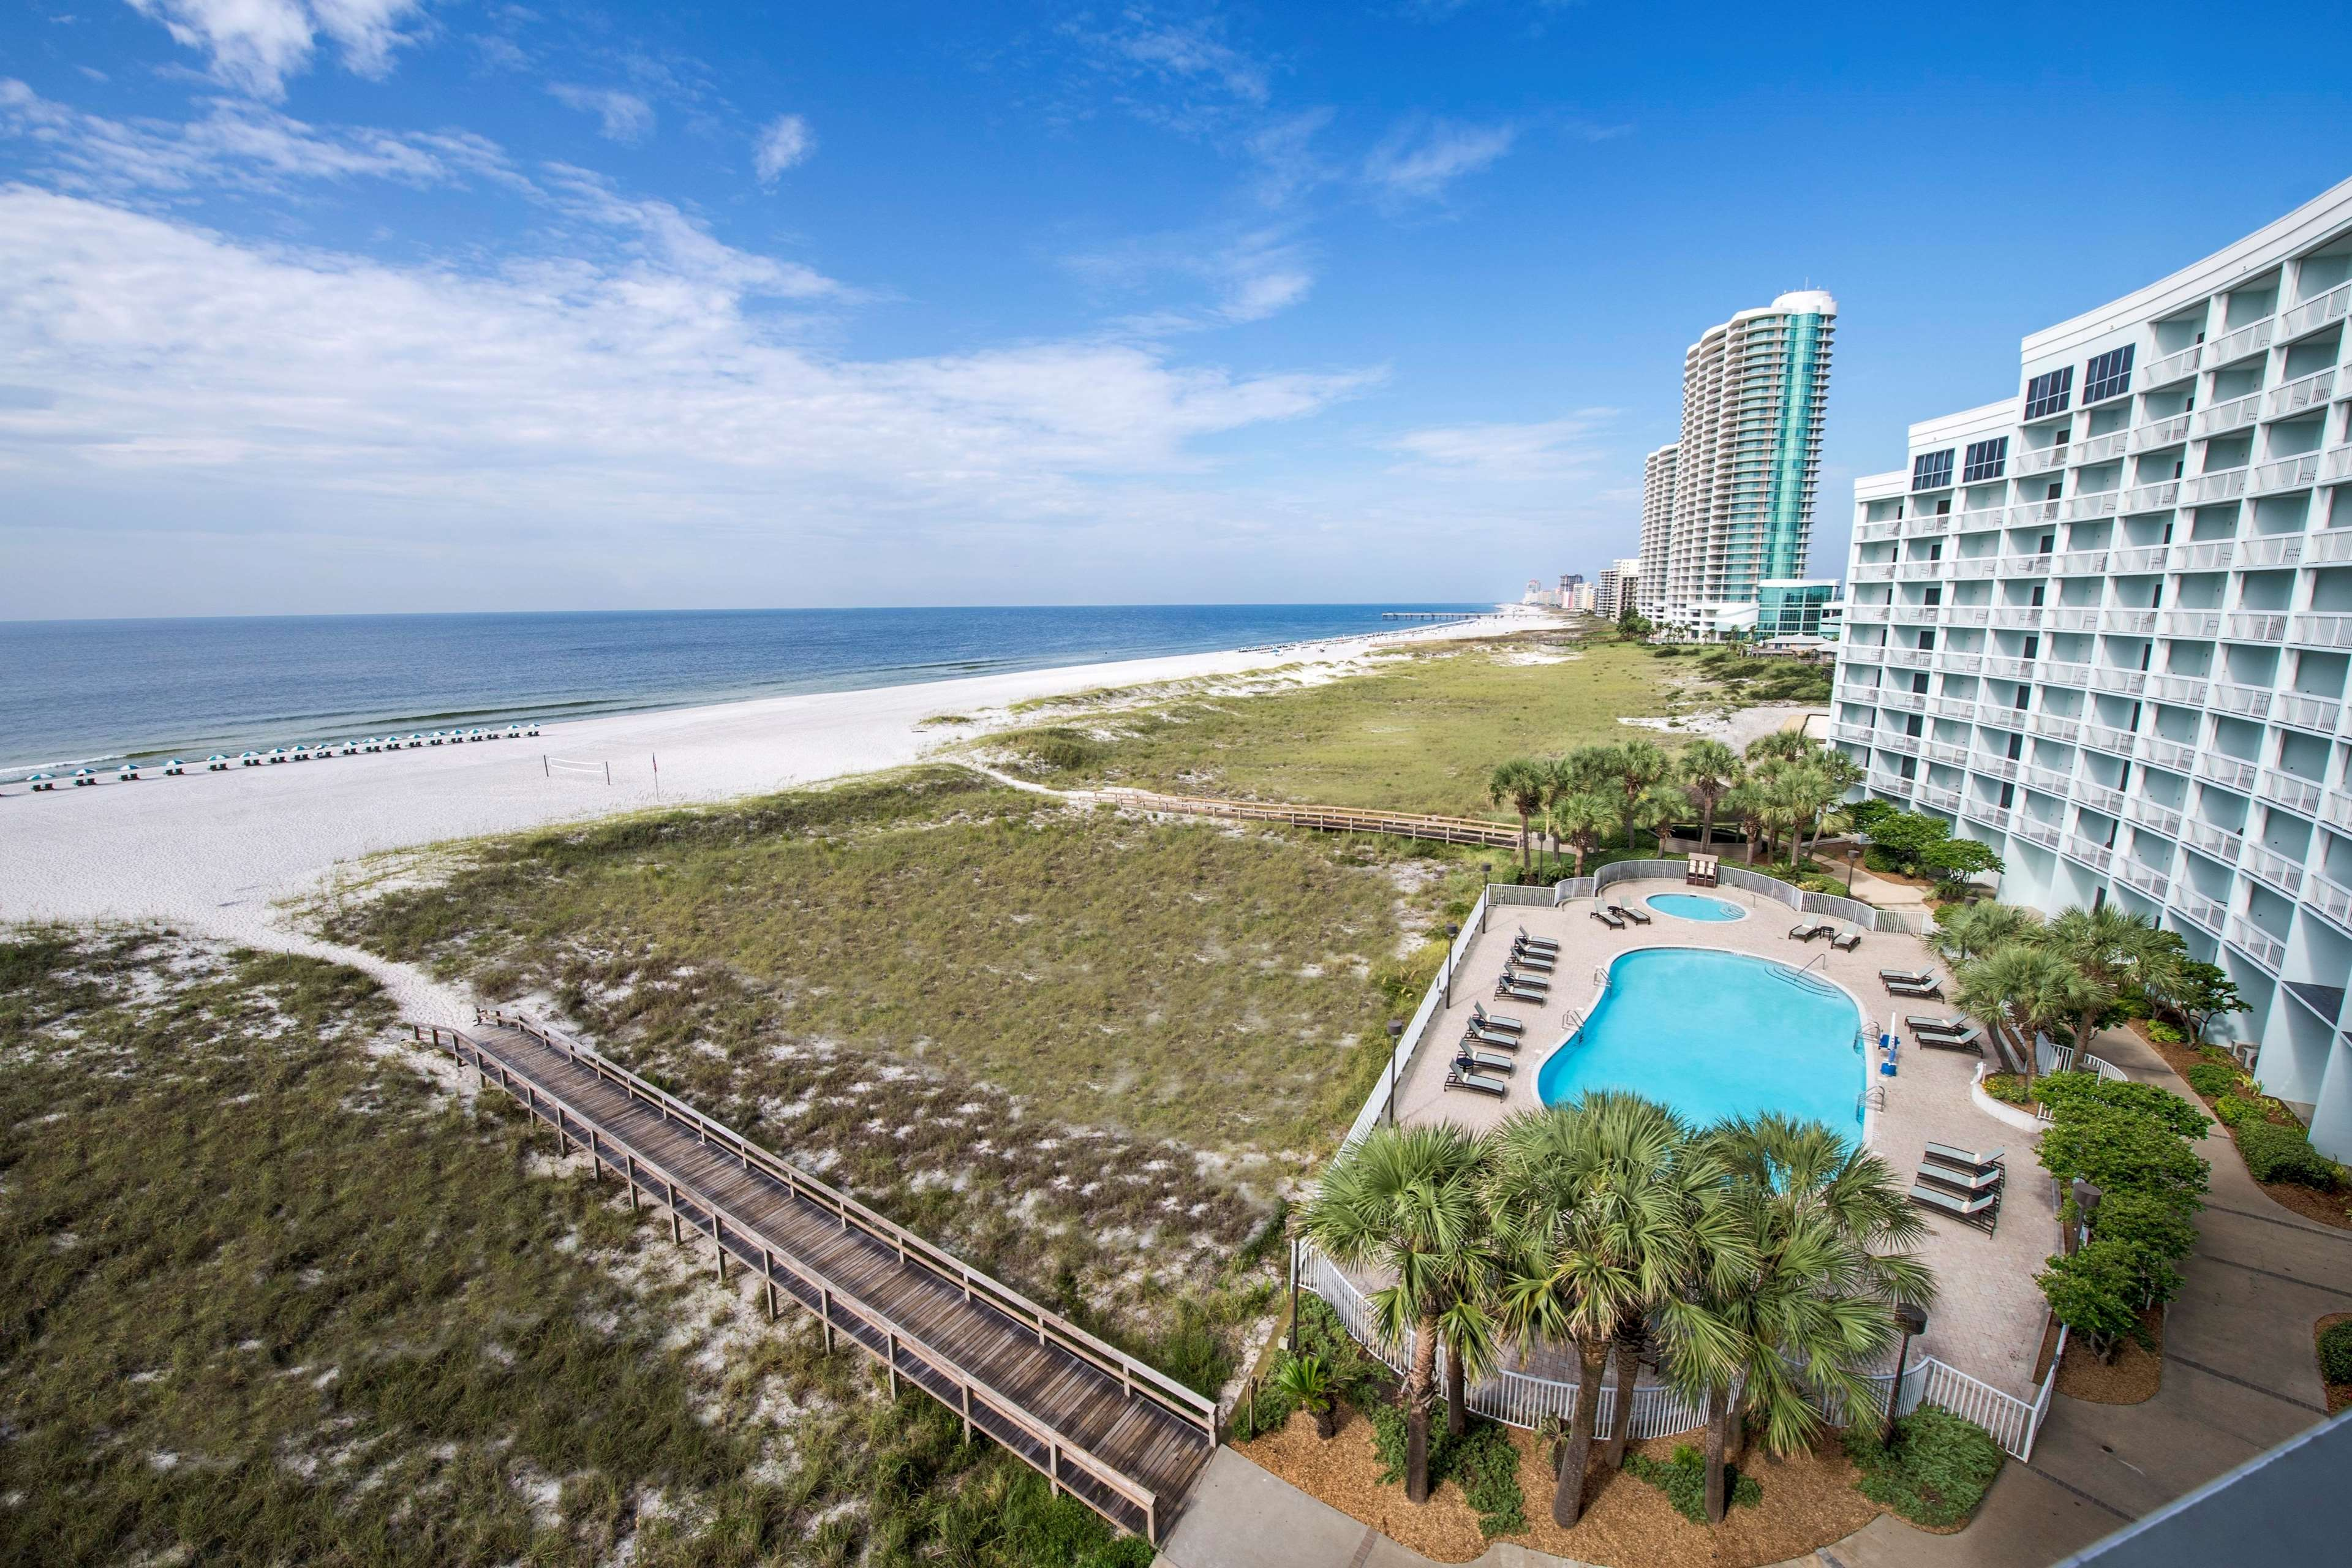 Island House Hotel Orange Beach A DoubleTree By Hilton. Hilton Garden Inn  Orange Beach AL ...